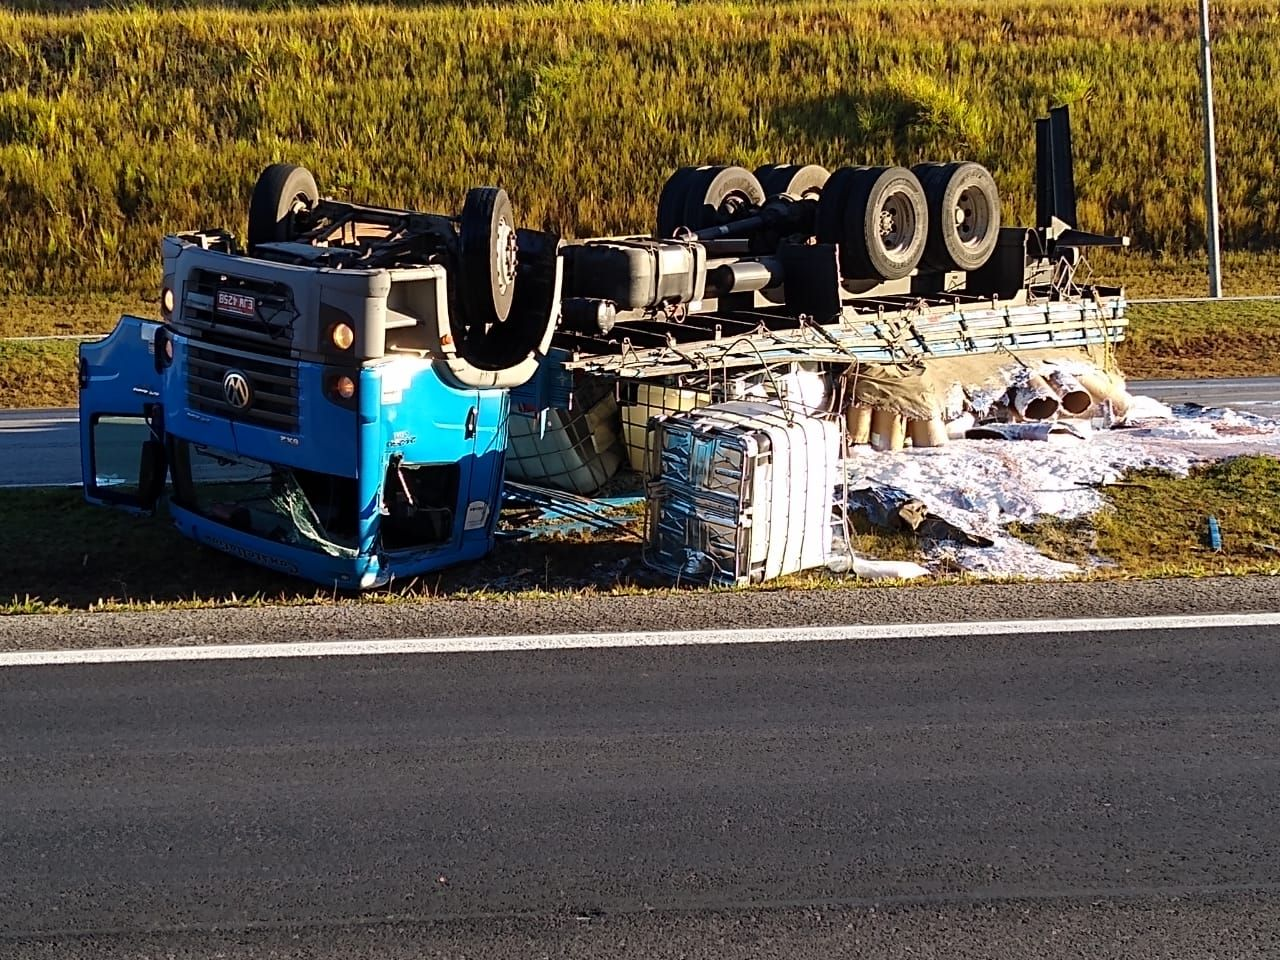 Caminhão tomba na rodovia Carvalho Pinto, trecho de São José